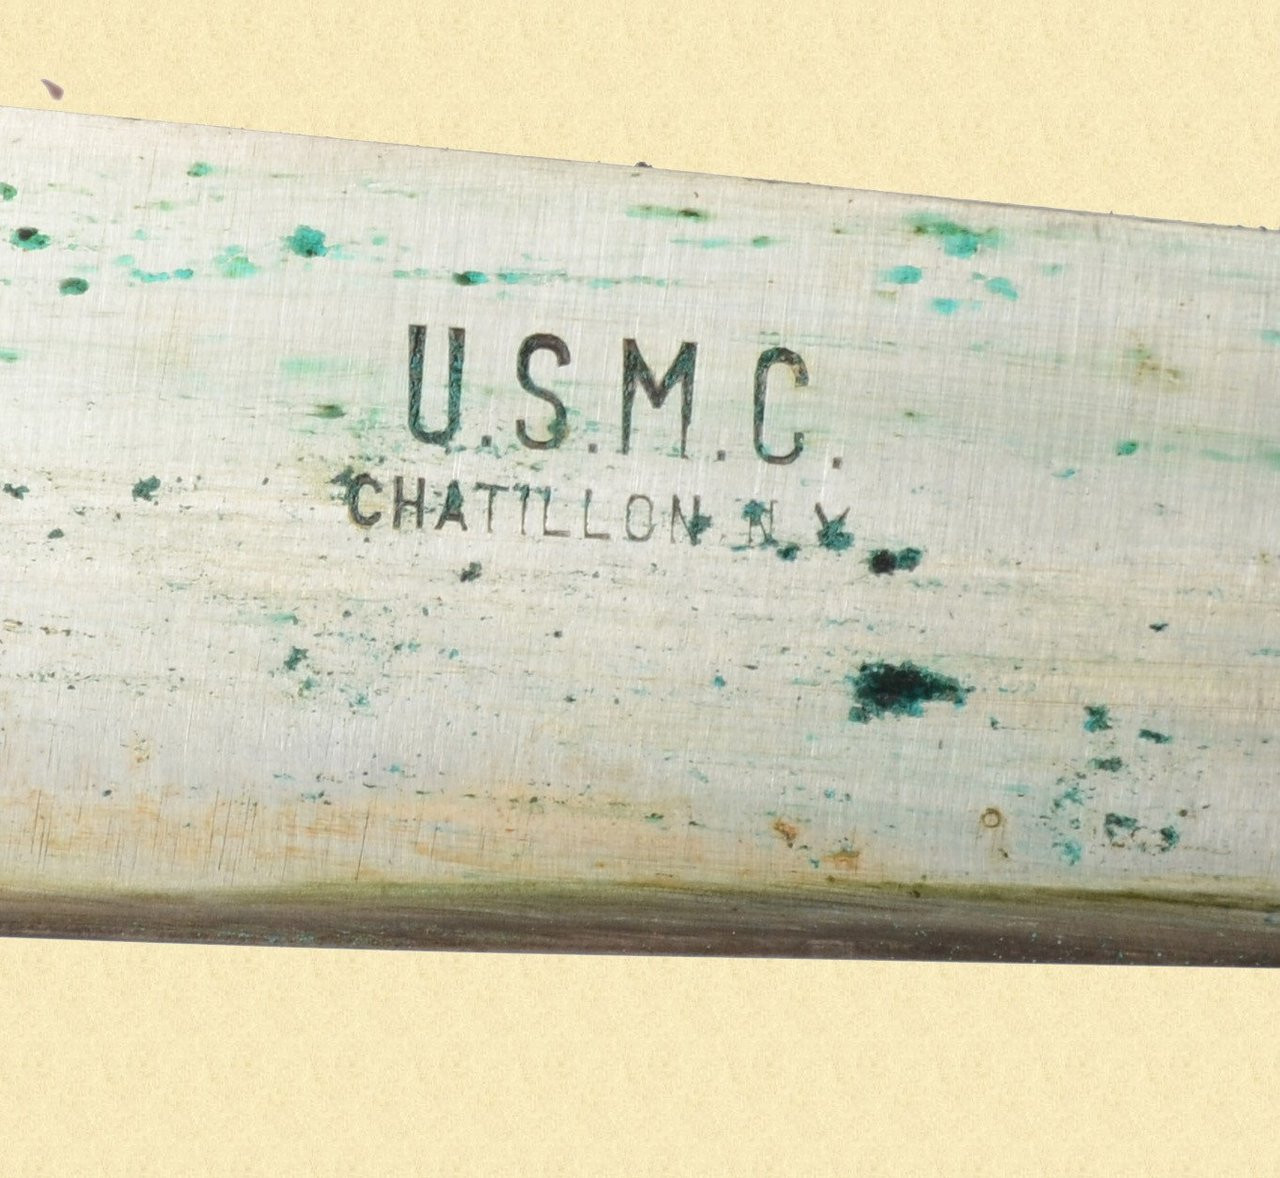 U.S.M.C. WW2 CORPSMANS KNIFE - C24849